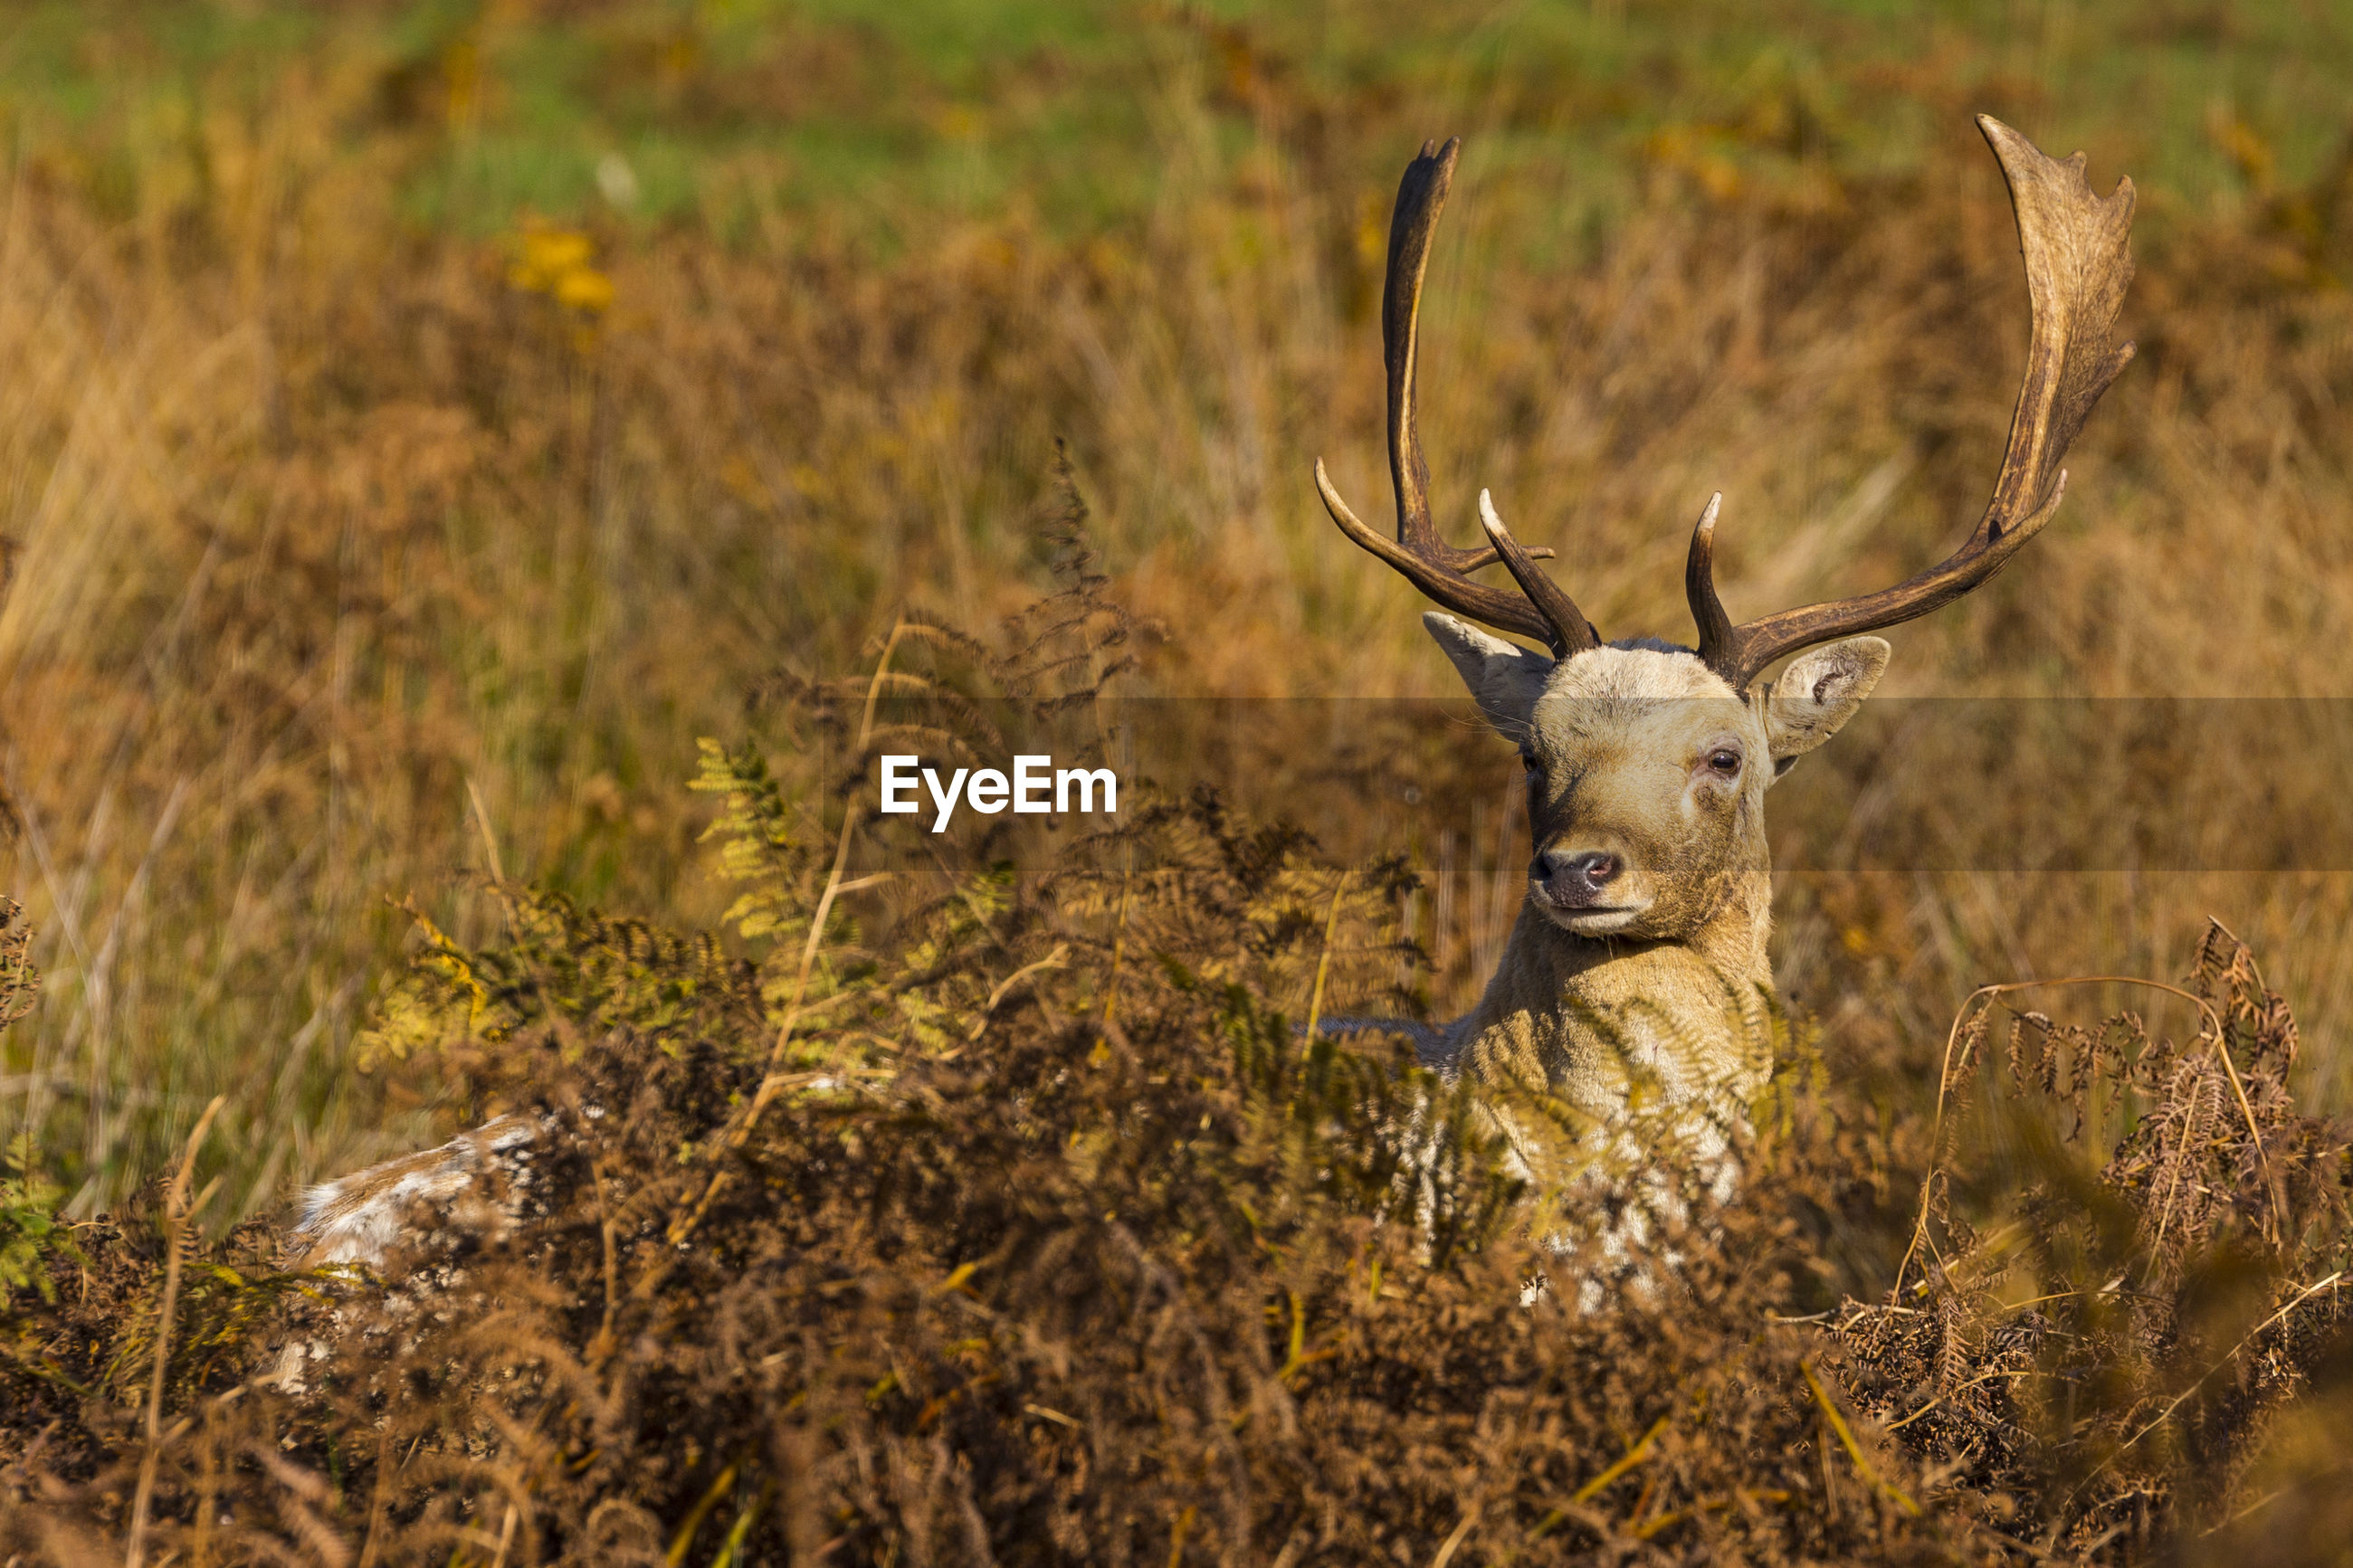 Close-up of deer in grass